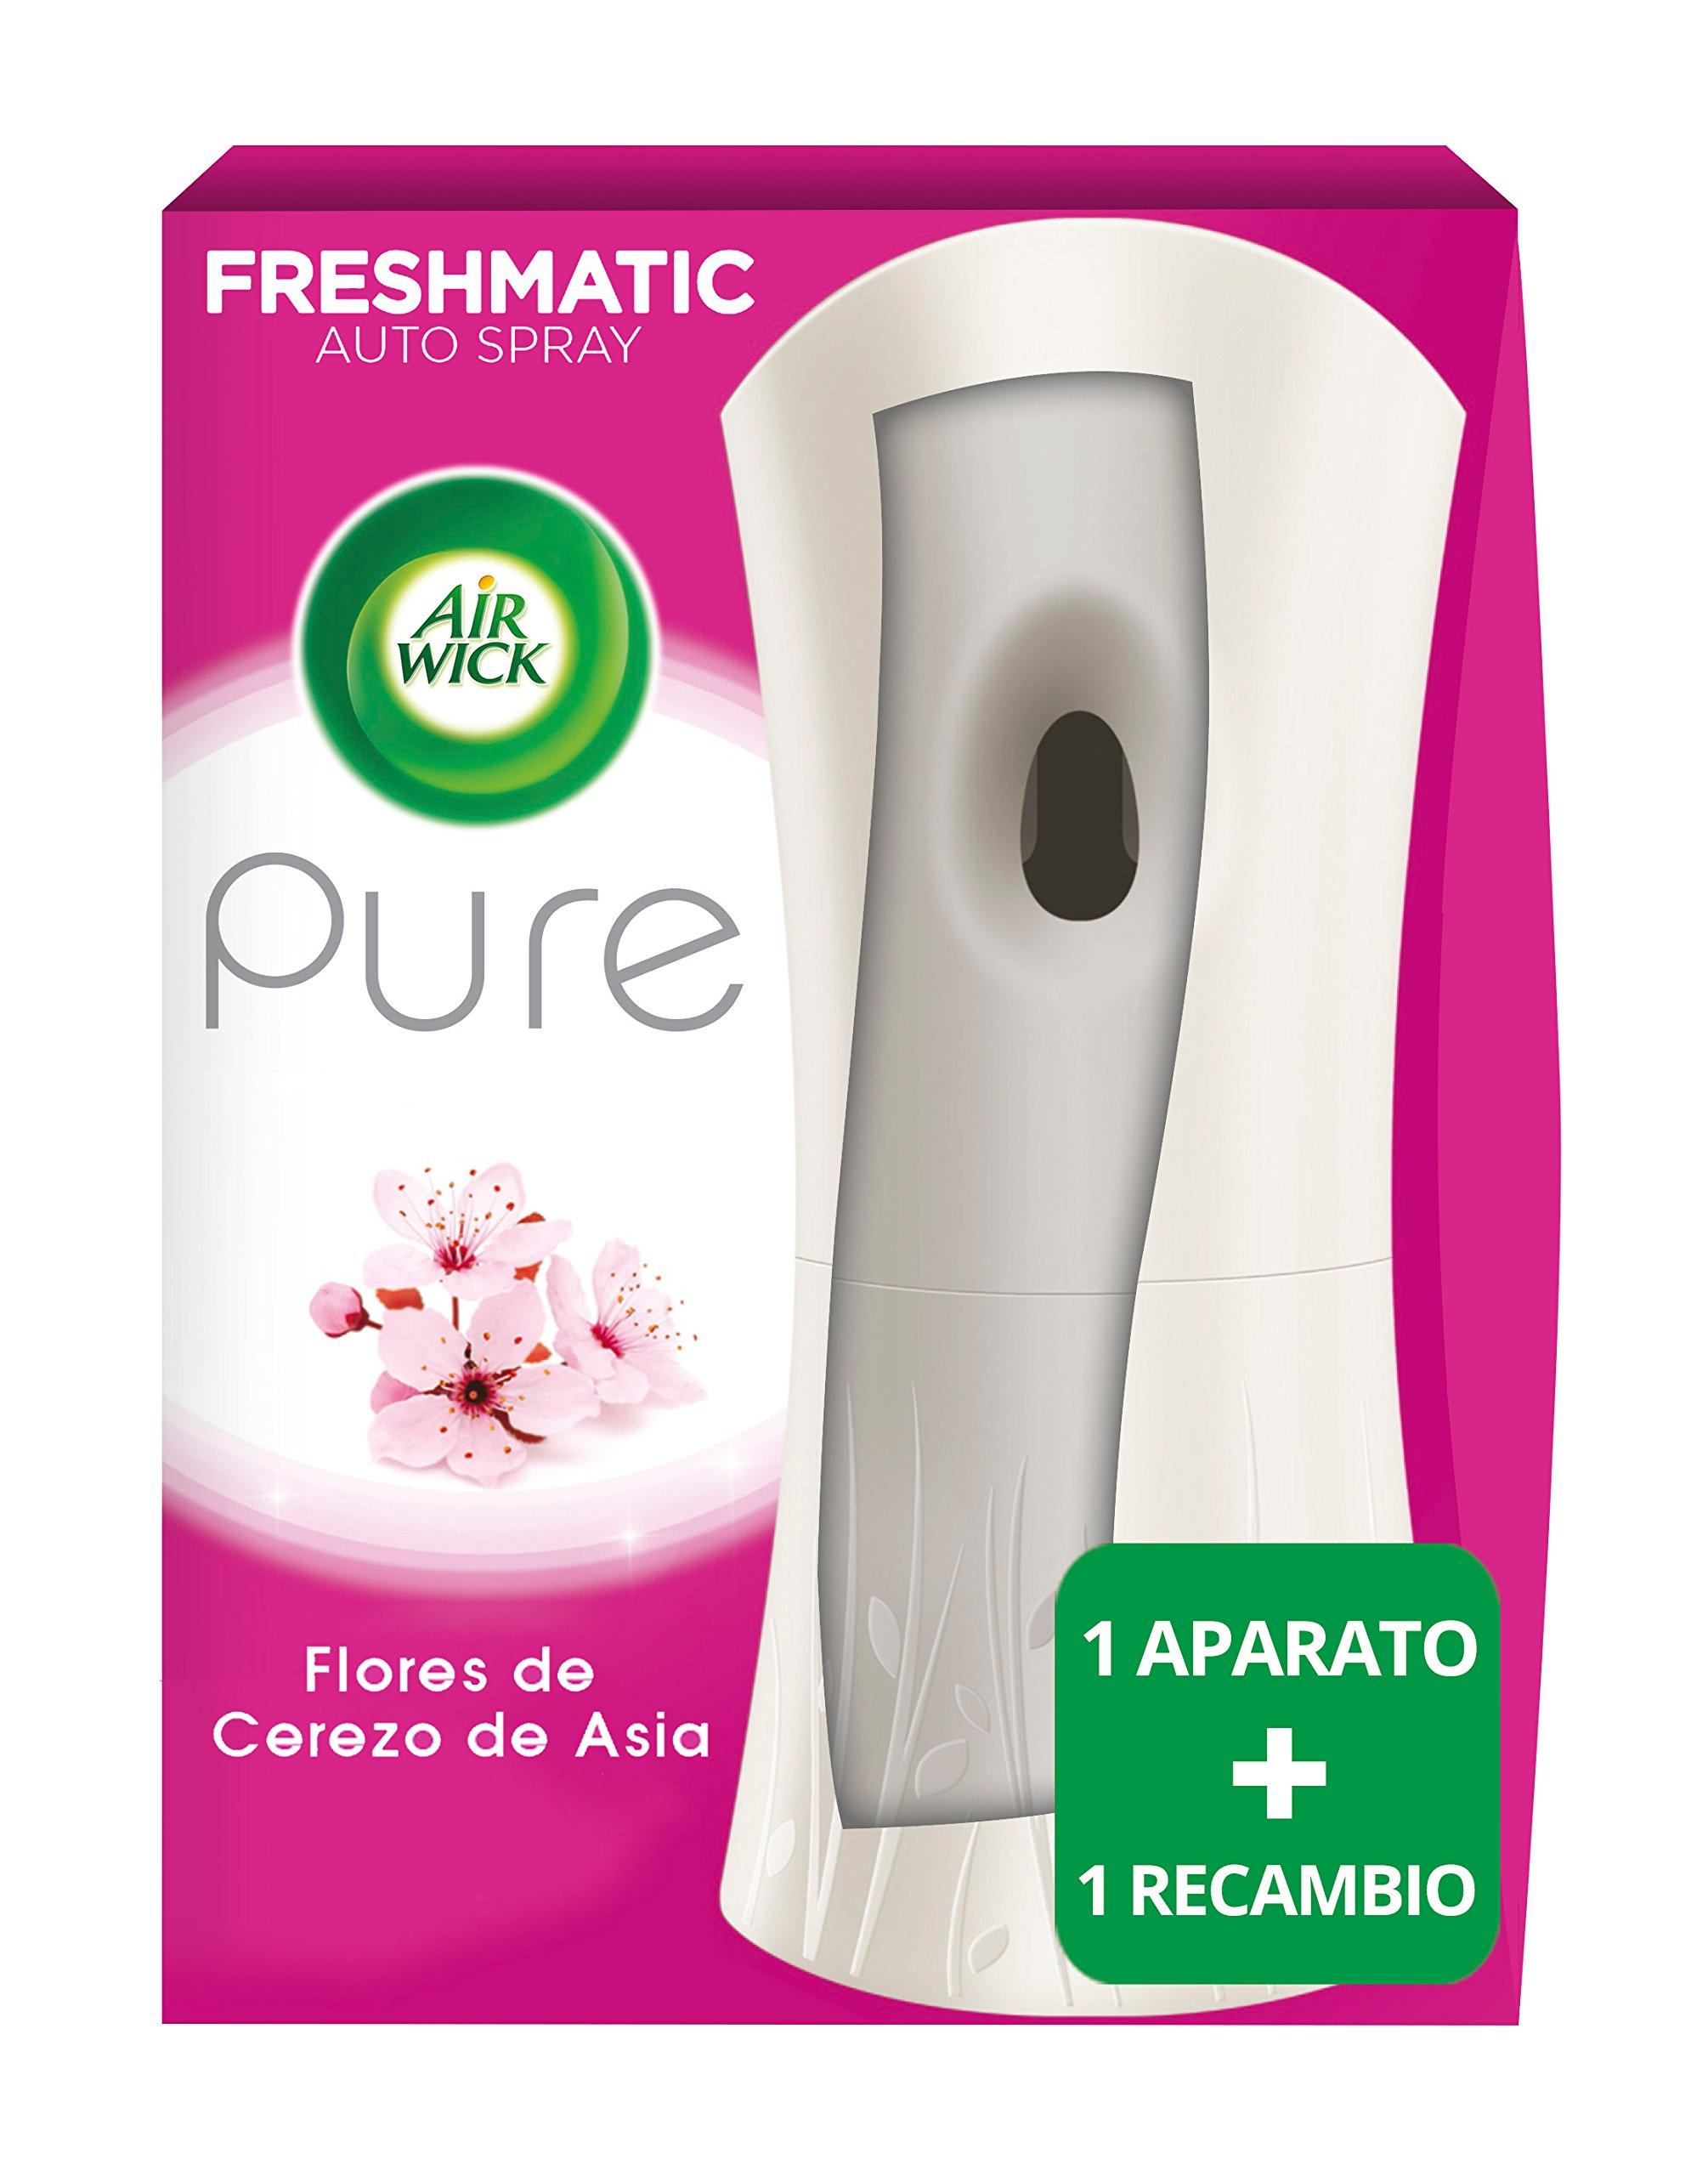 Air Wick Ambientador Freshmatic Completo Pure Flores de Cerezo de Asia product image